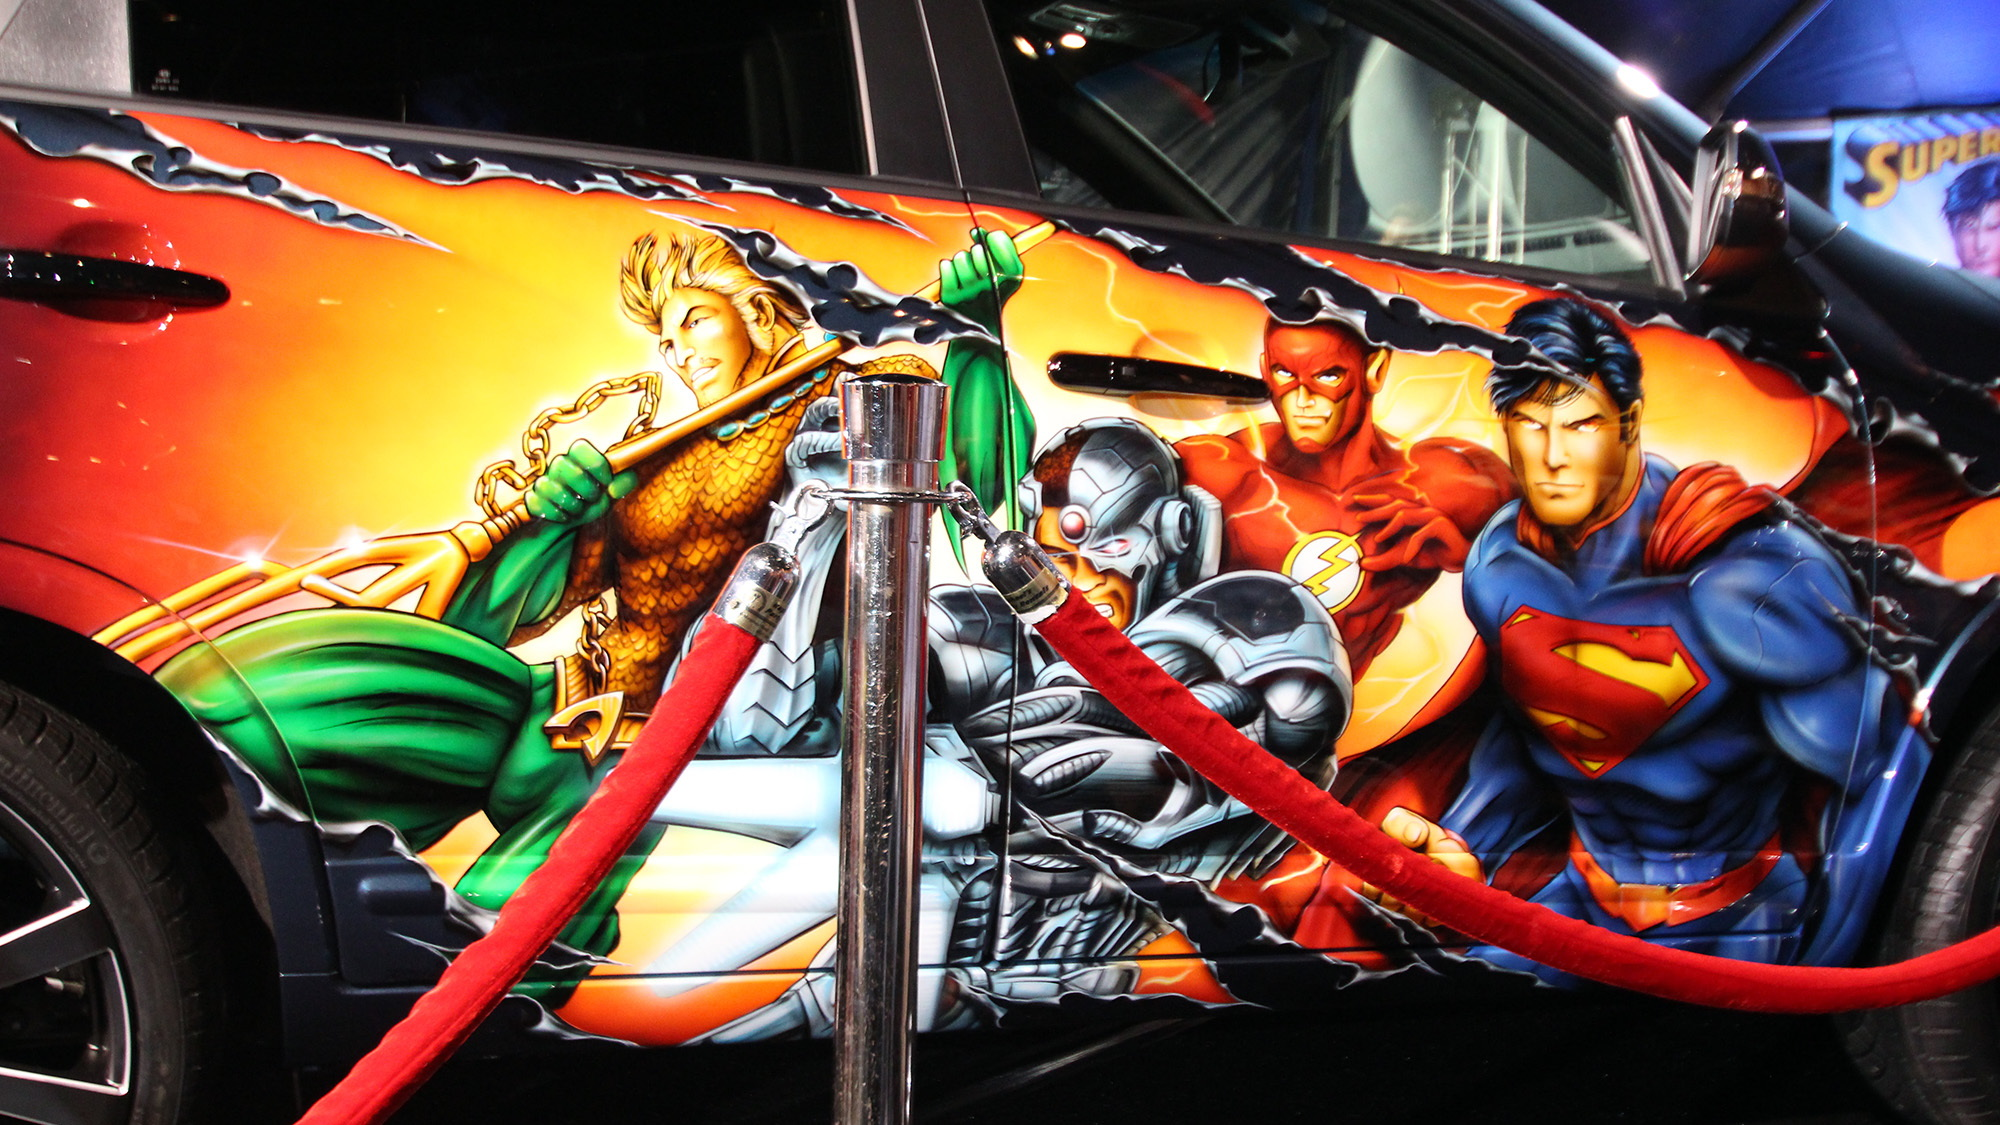 kia brings justice league sorento to comic con